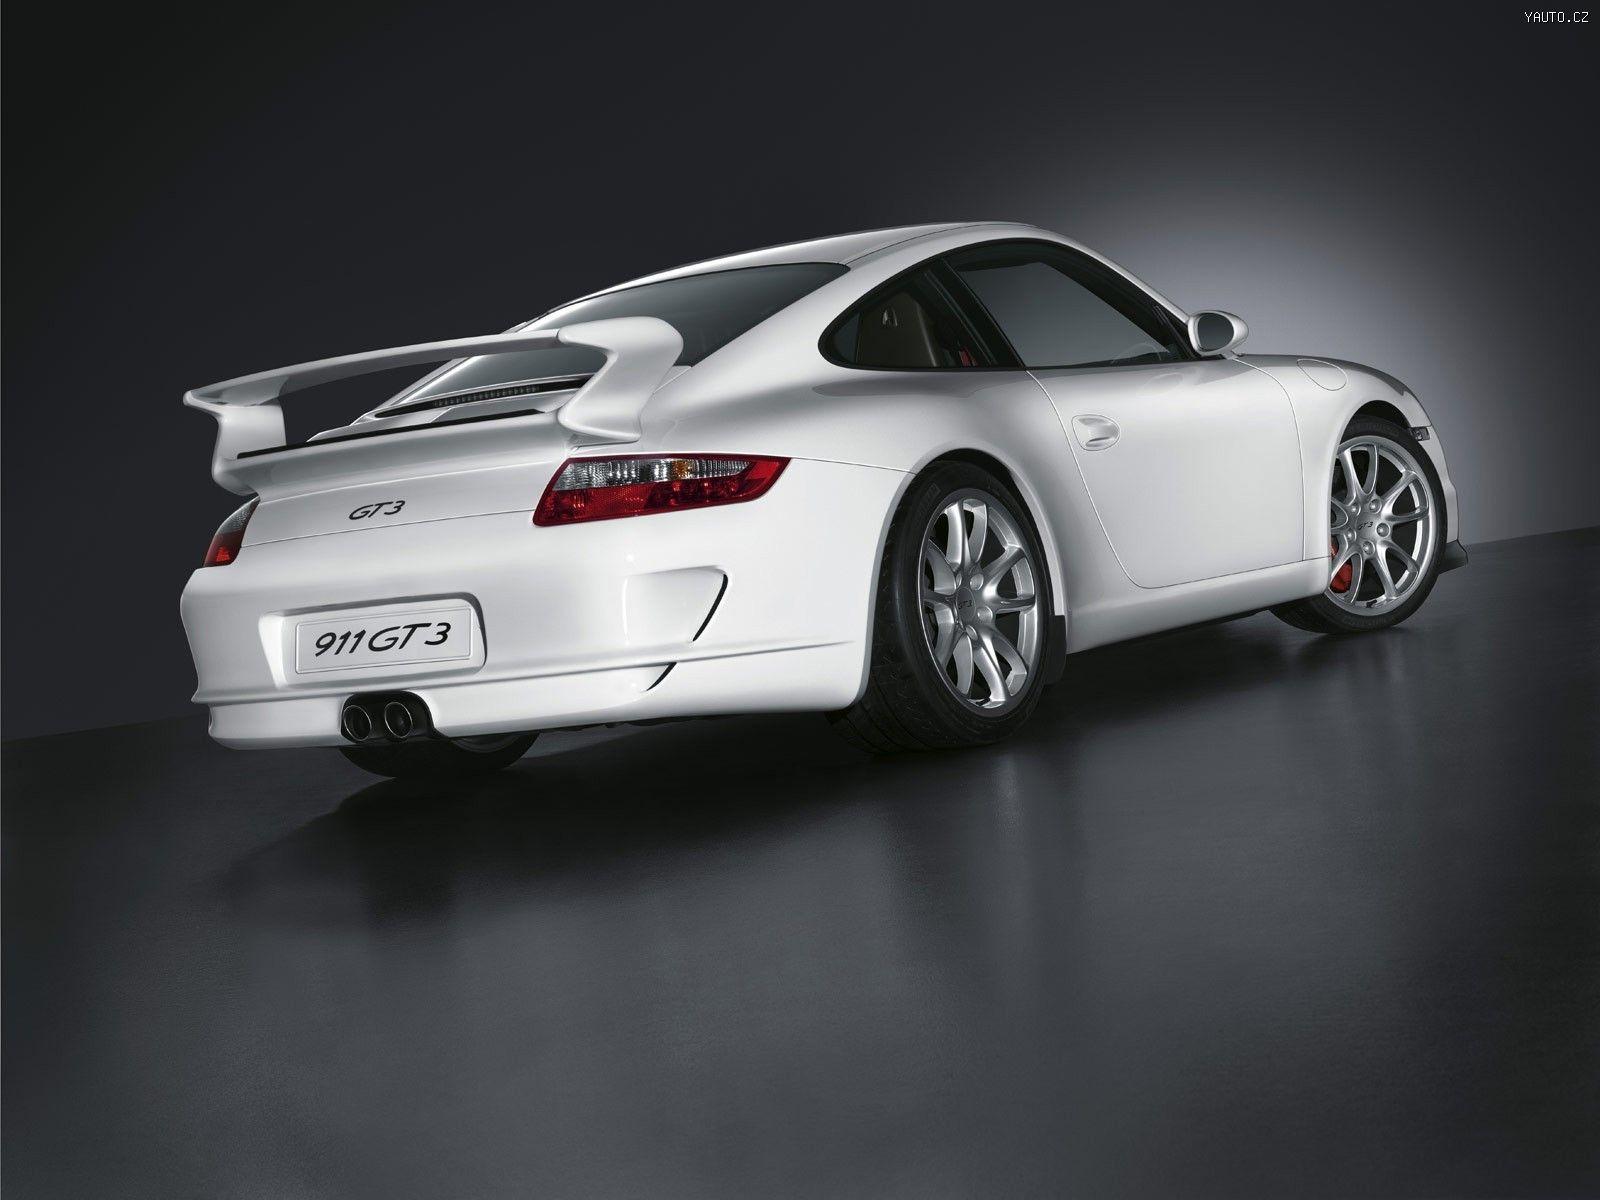 http://img.yauto.cz/tapety/Porsche_911_GT3_2006_8.jpg